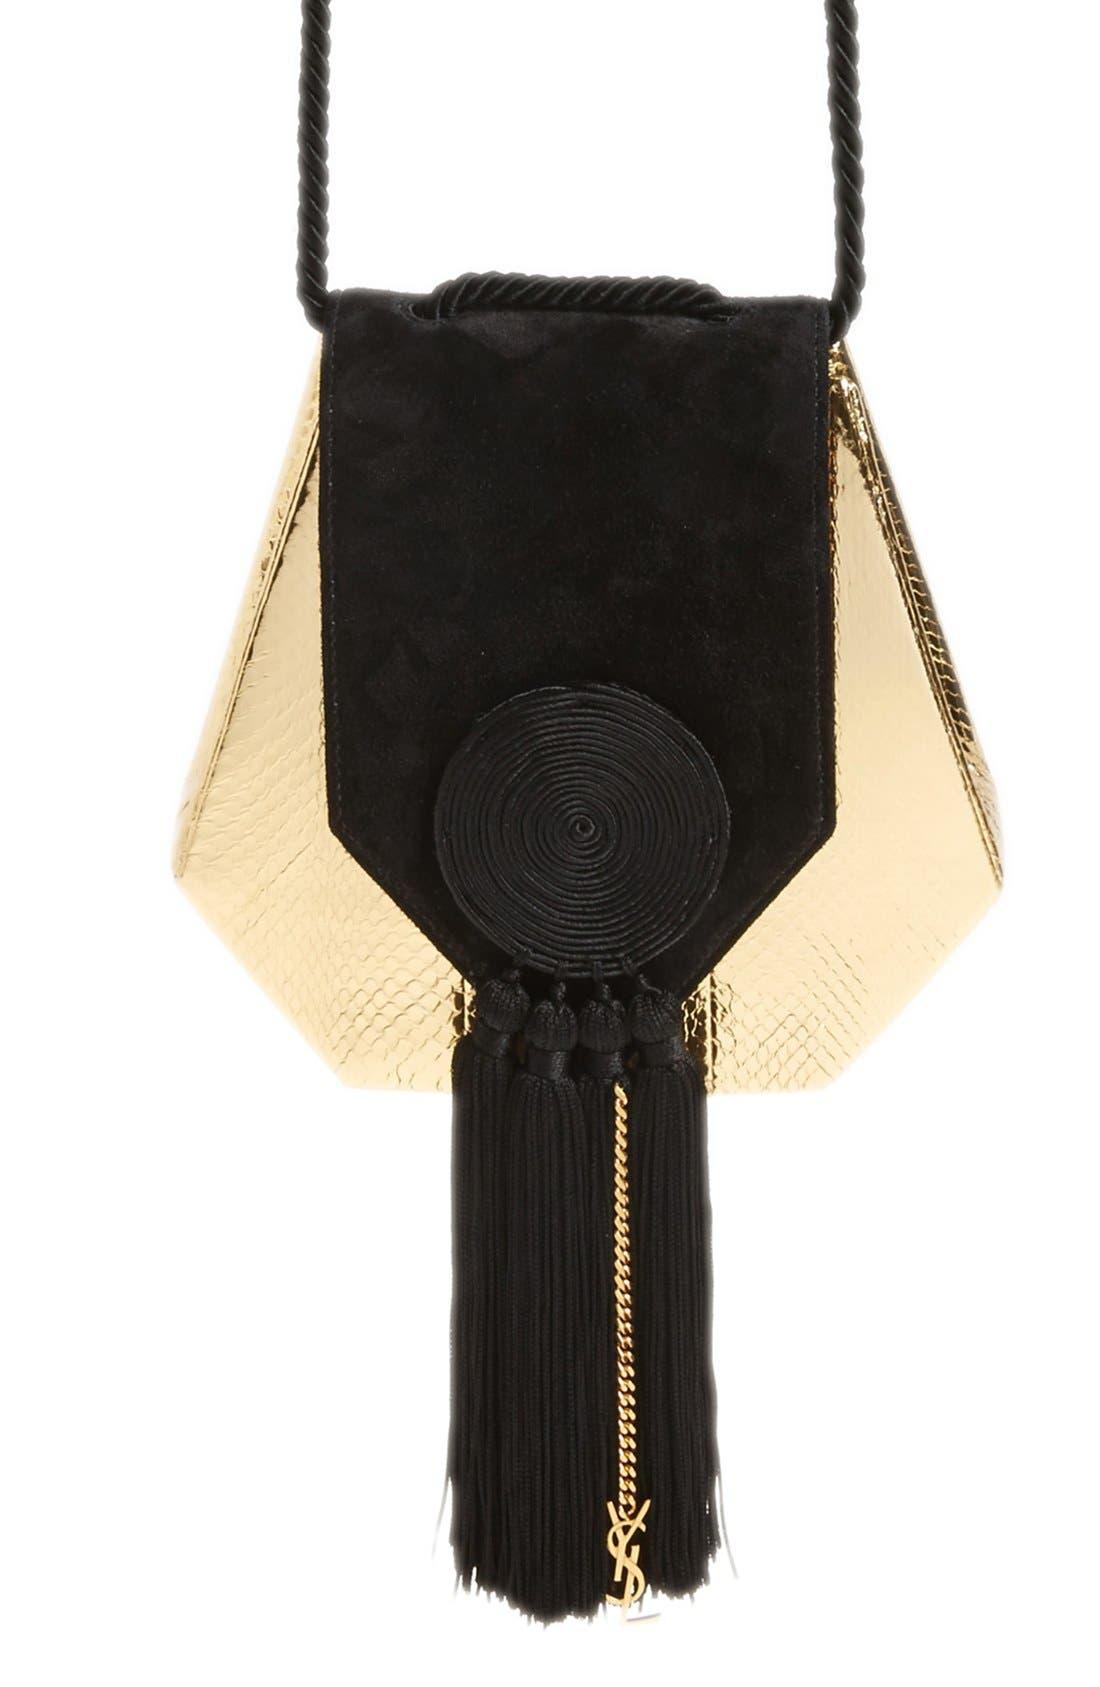 Alternate Image 1 Selected - Saint Laurent 'Opium' Genuine Snakeskin & Leather Saddle Bag